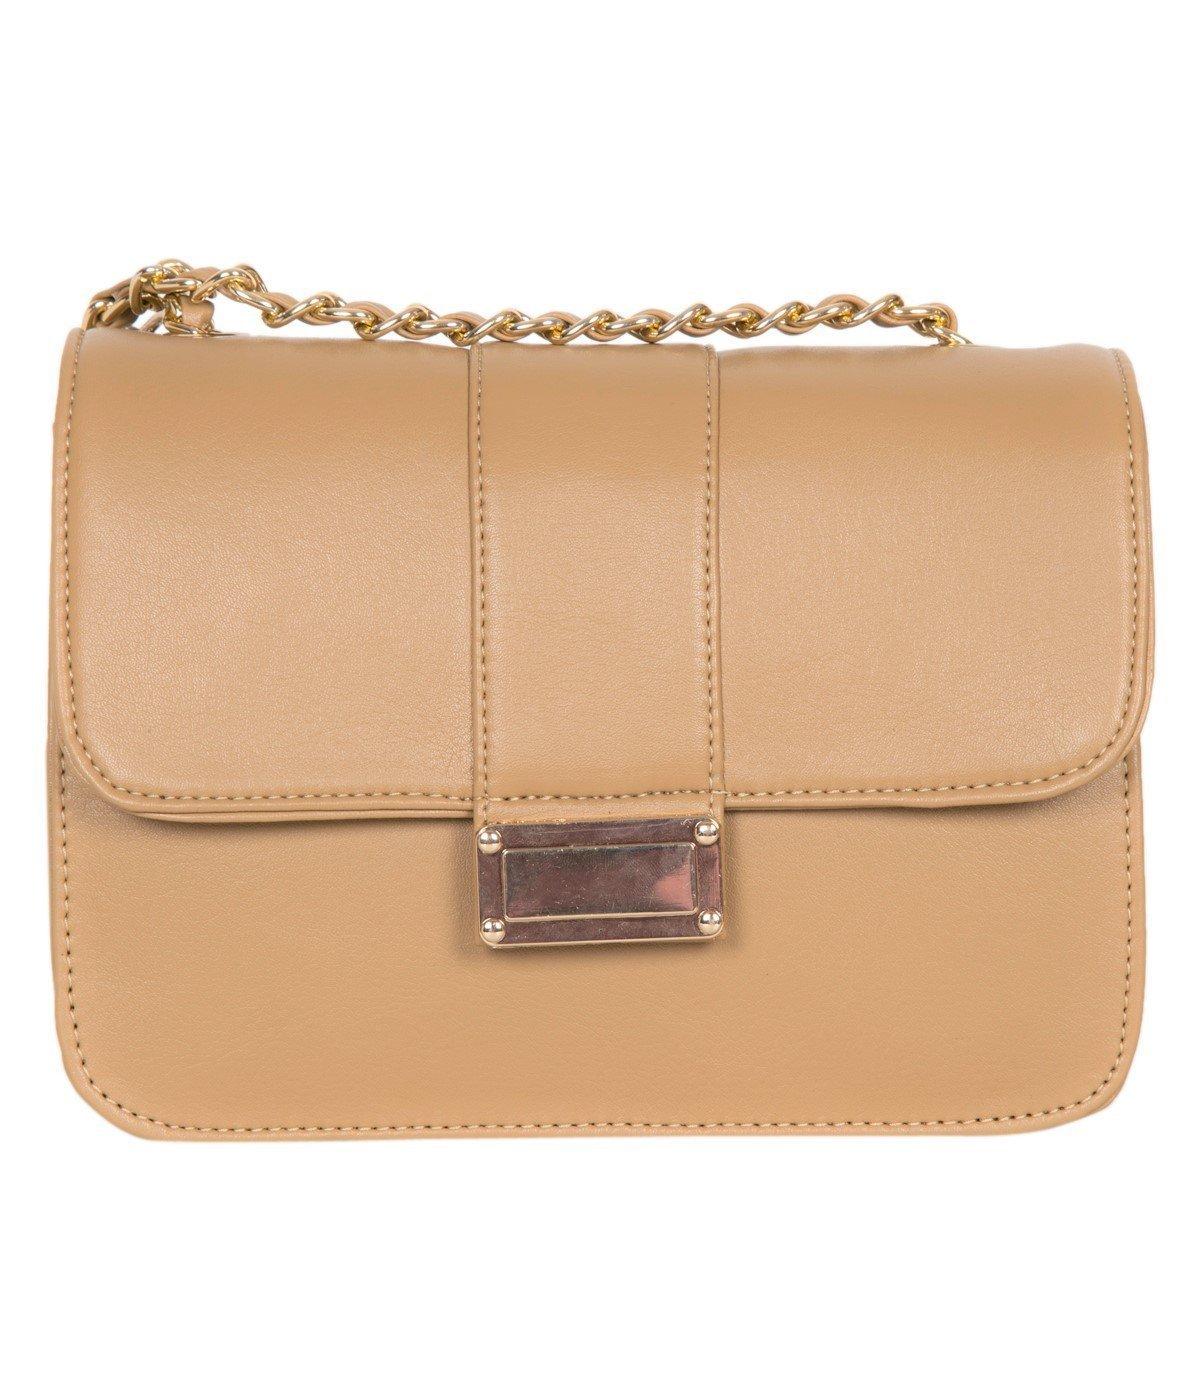 c6b242dfe9a ADISA SL5013 women girls party sling bag – Shopss